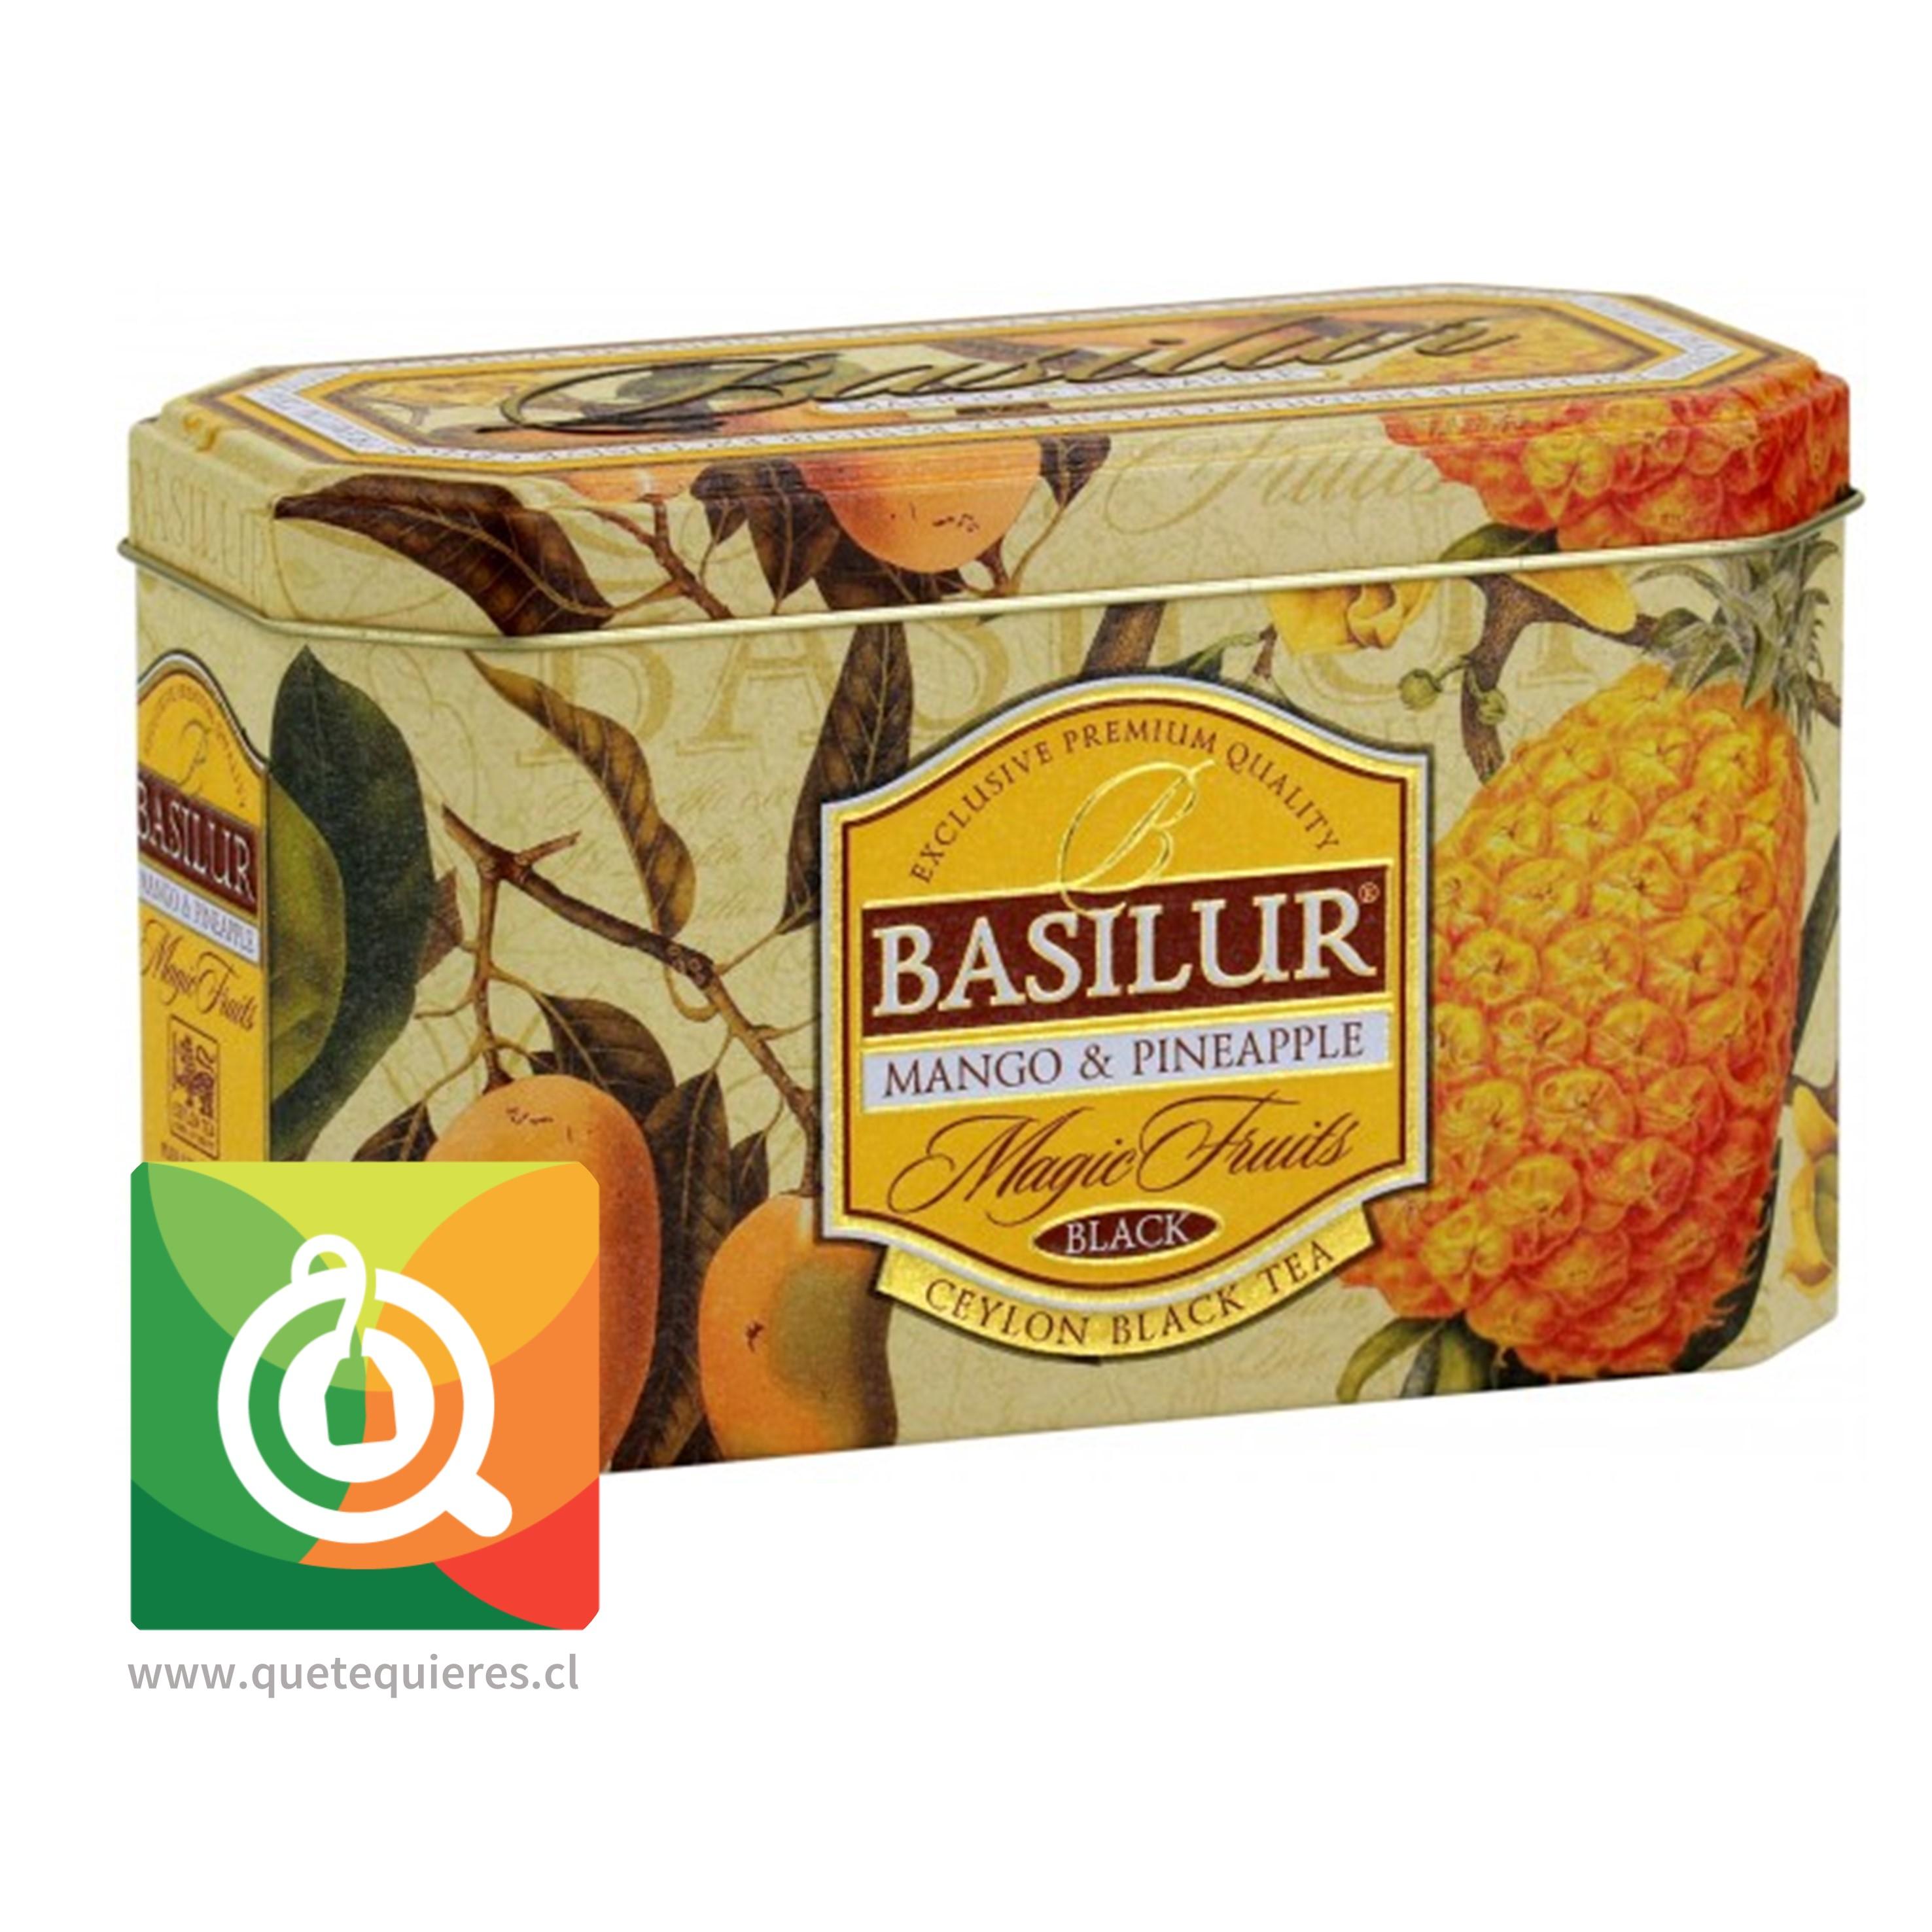 Basilur Lata Té Negro Mago y Piña - Magic Fruit Mango & Pineapple - Image 1